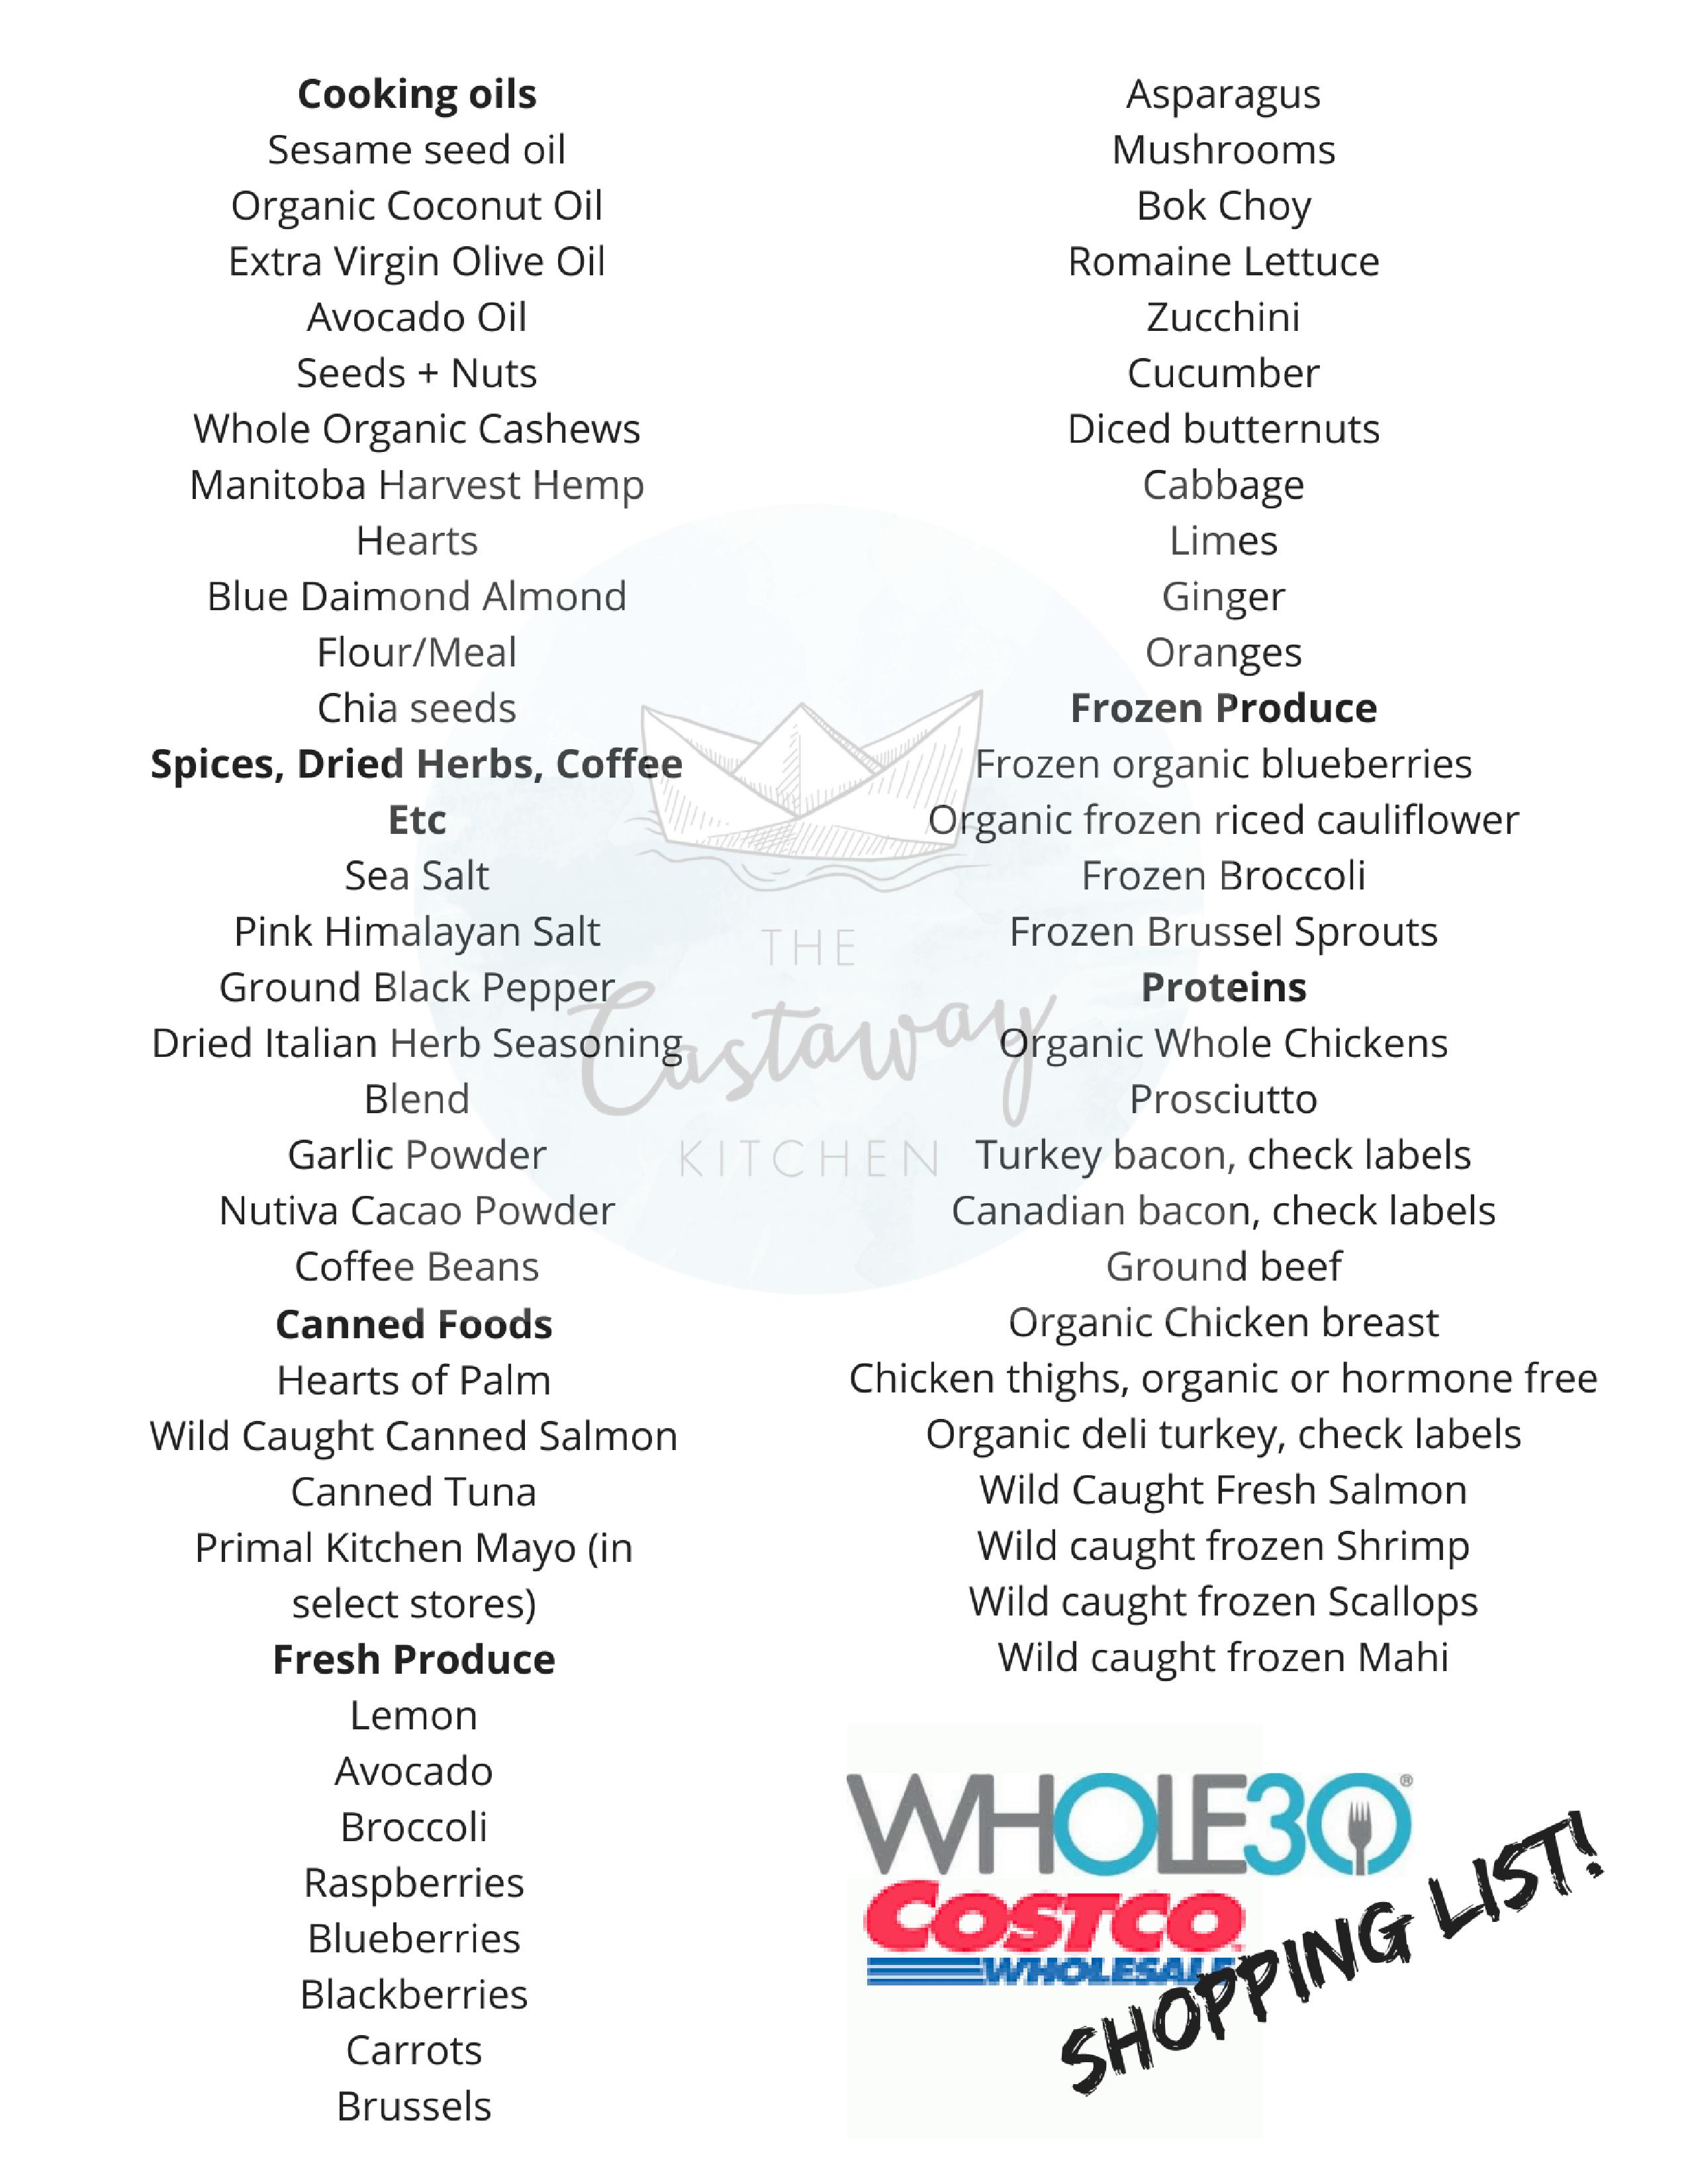 Whole30 Costco Shopping List (compliant printable list!)